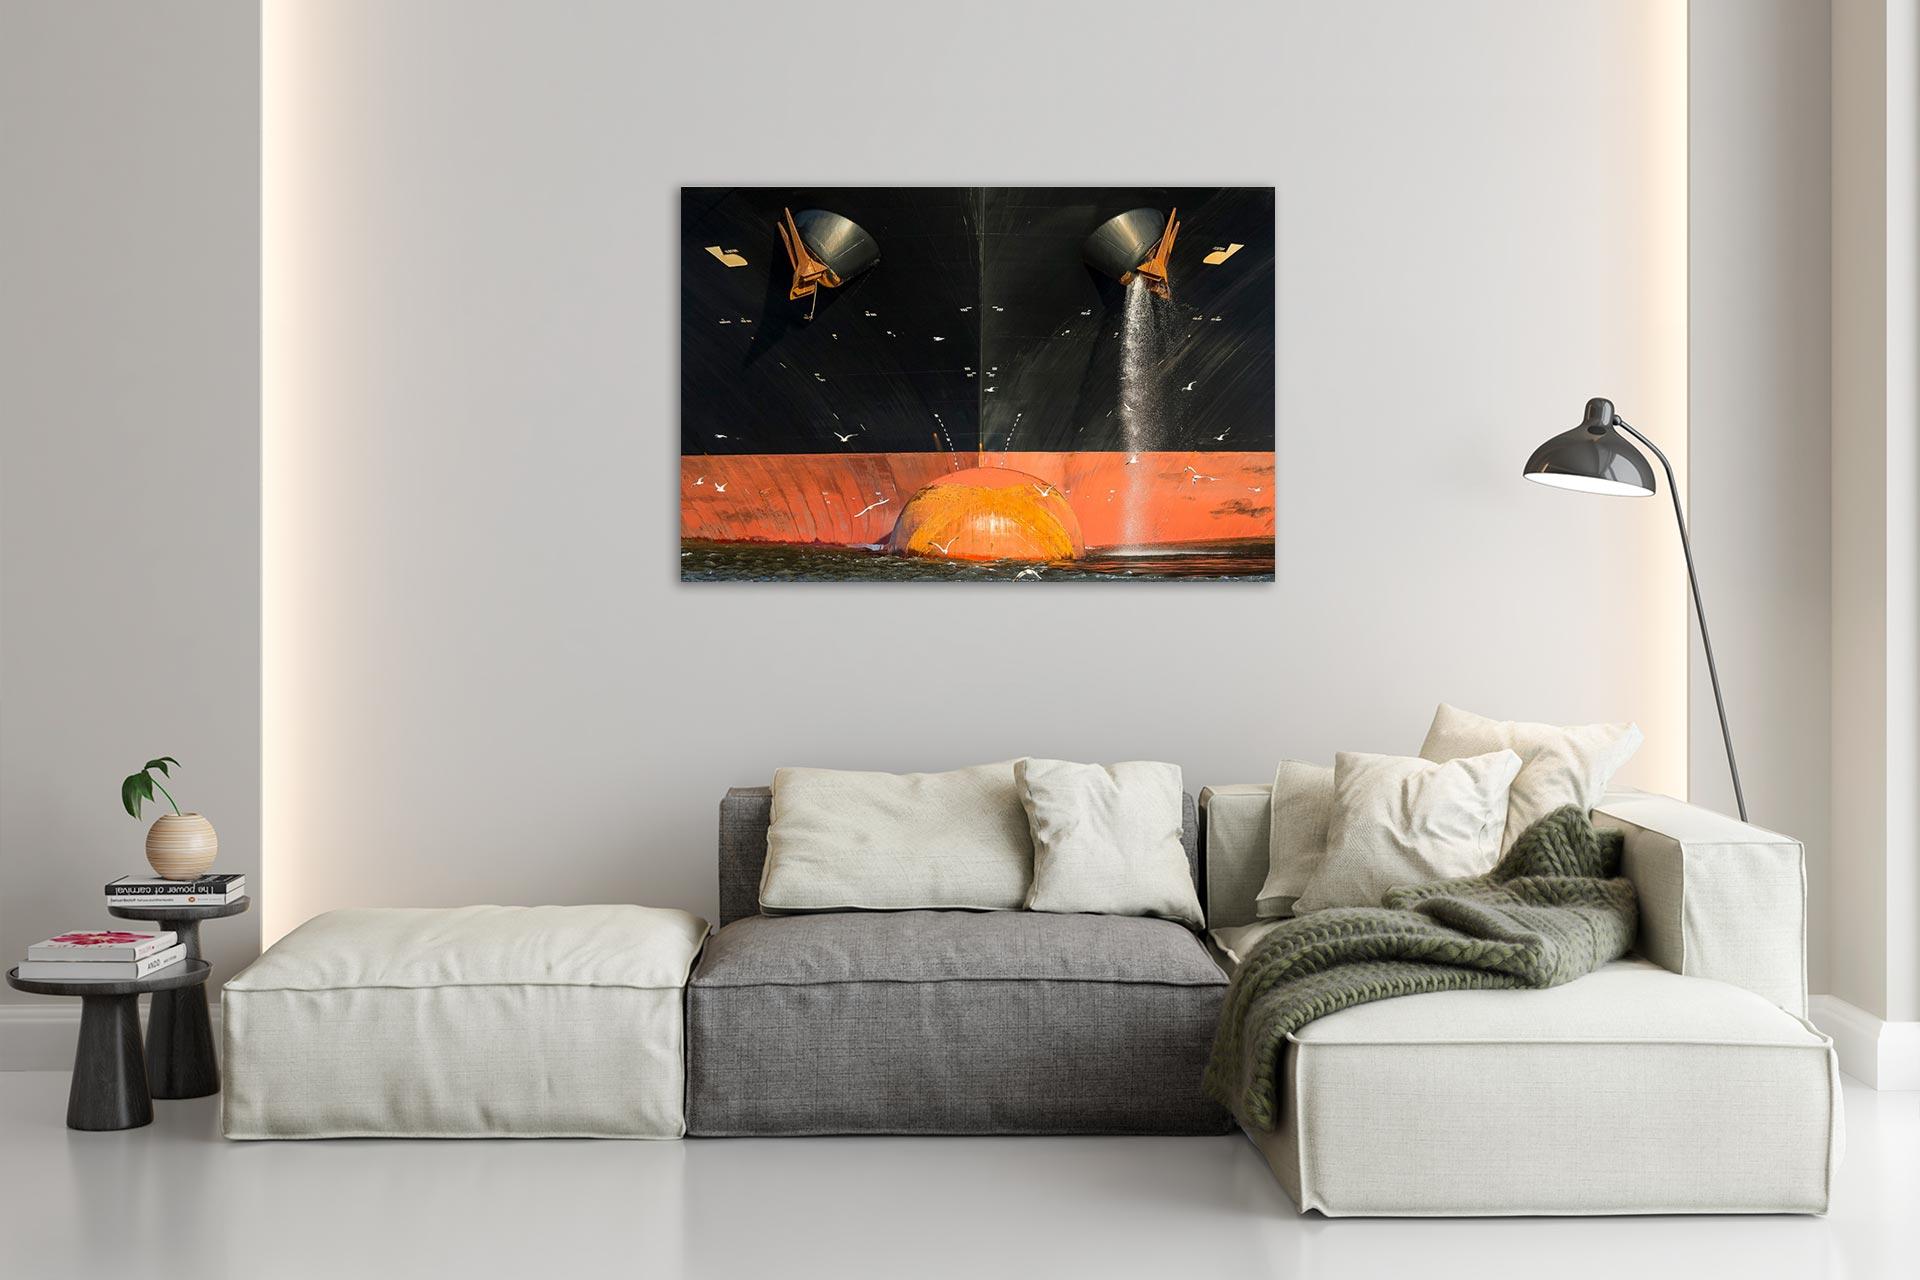 JS067-bug-hamburg-wandbild-bild-auf-leinwand-acrylglas-aludibond-wohnzimmer